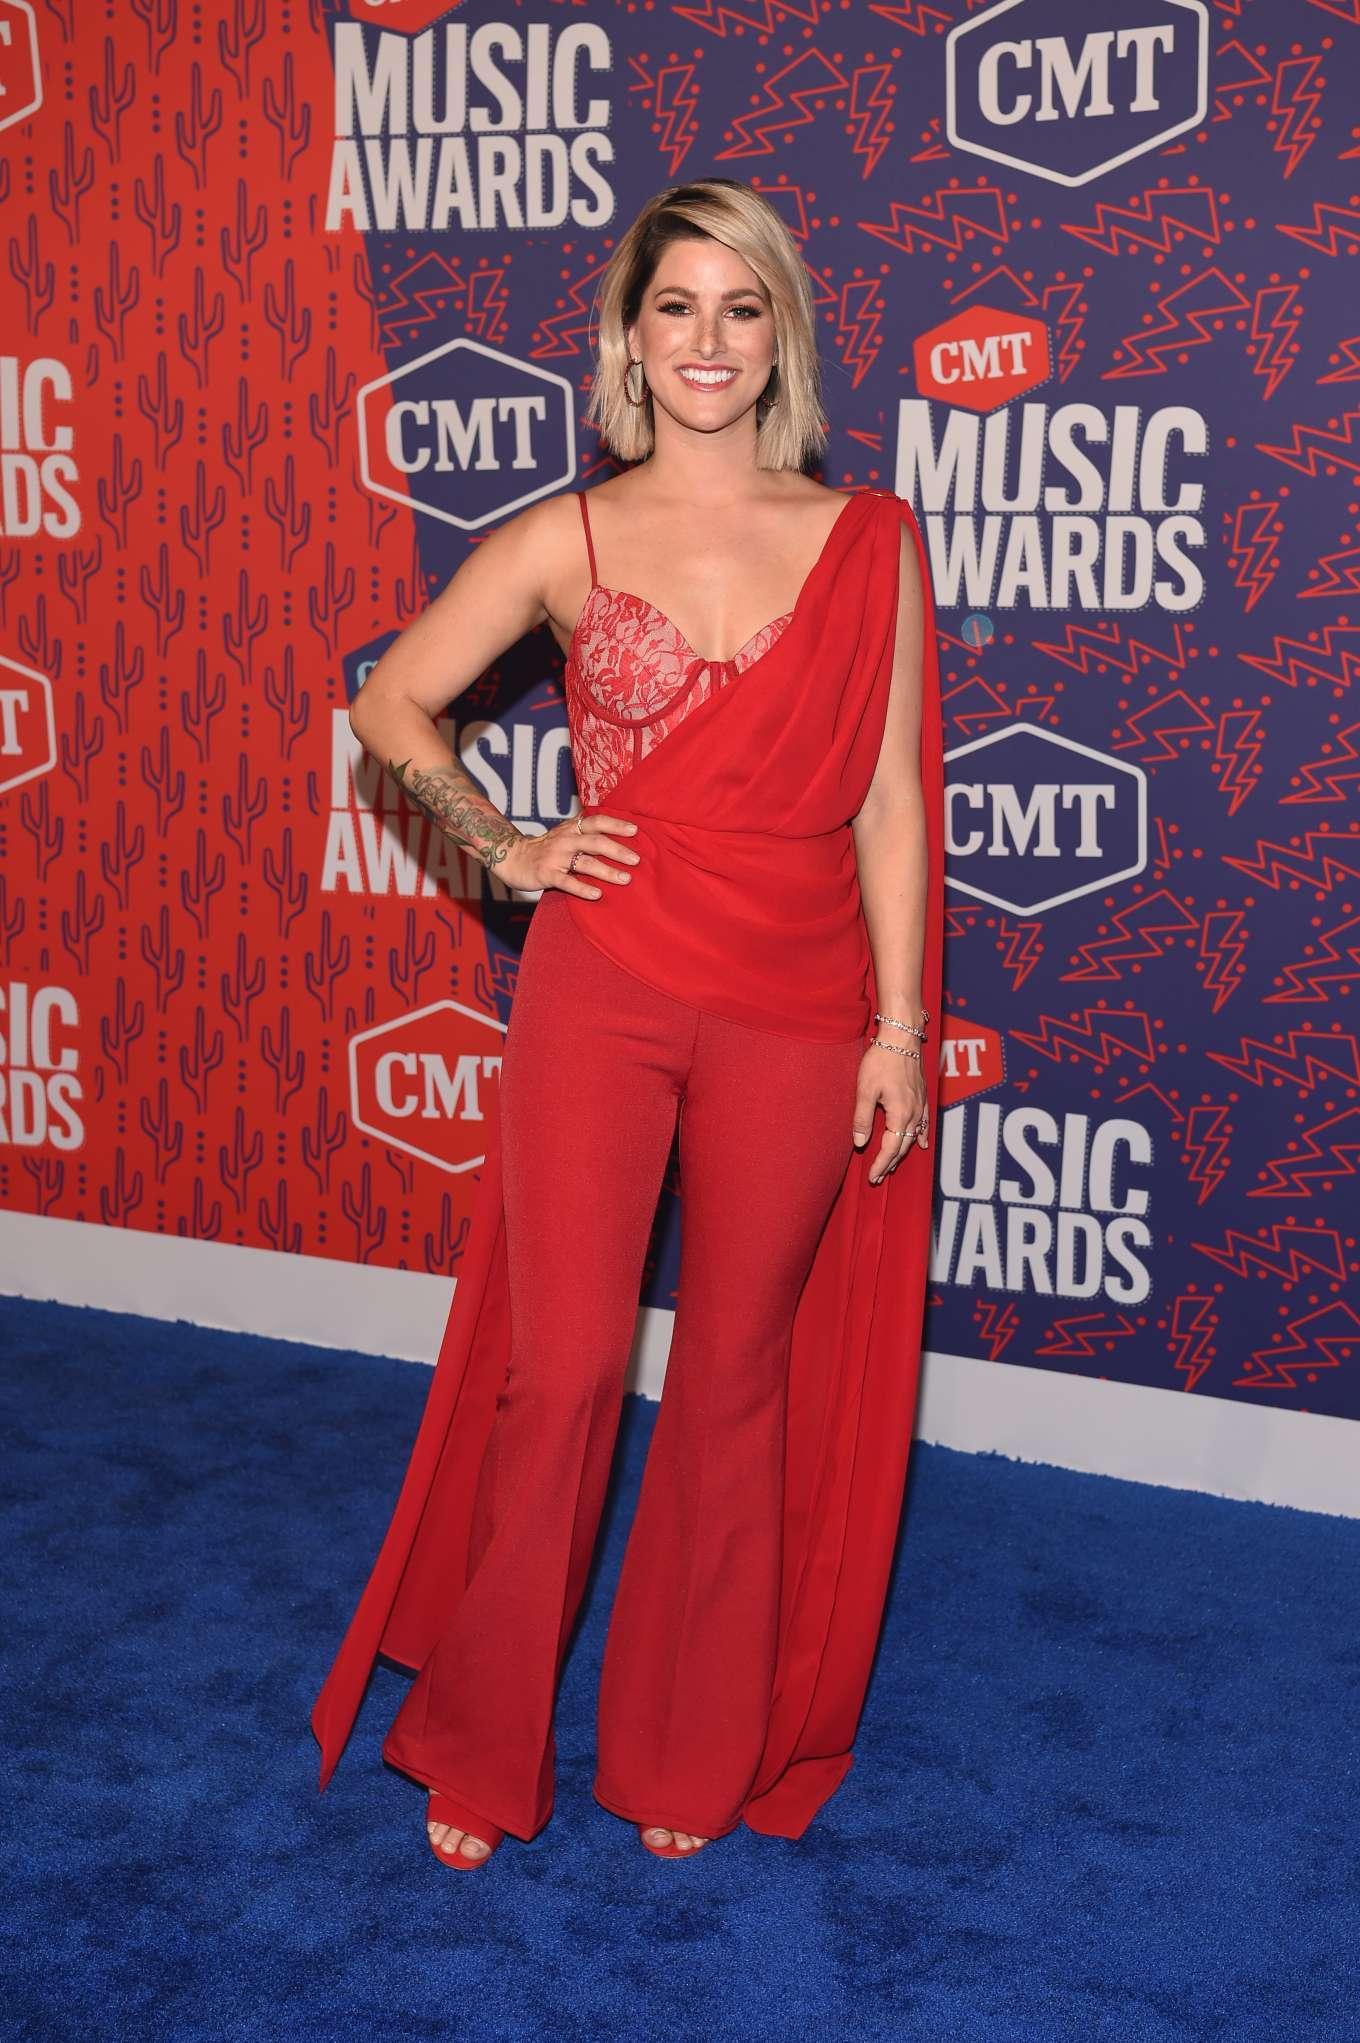 Cassadee Pope 2019 : Cassadee Pope: 2019 CMT Music Awards-10